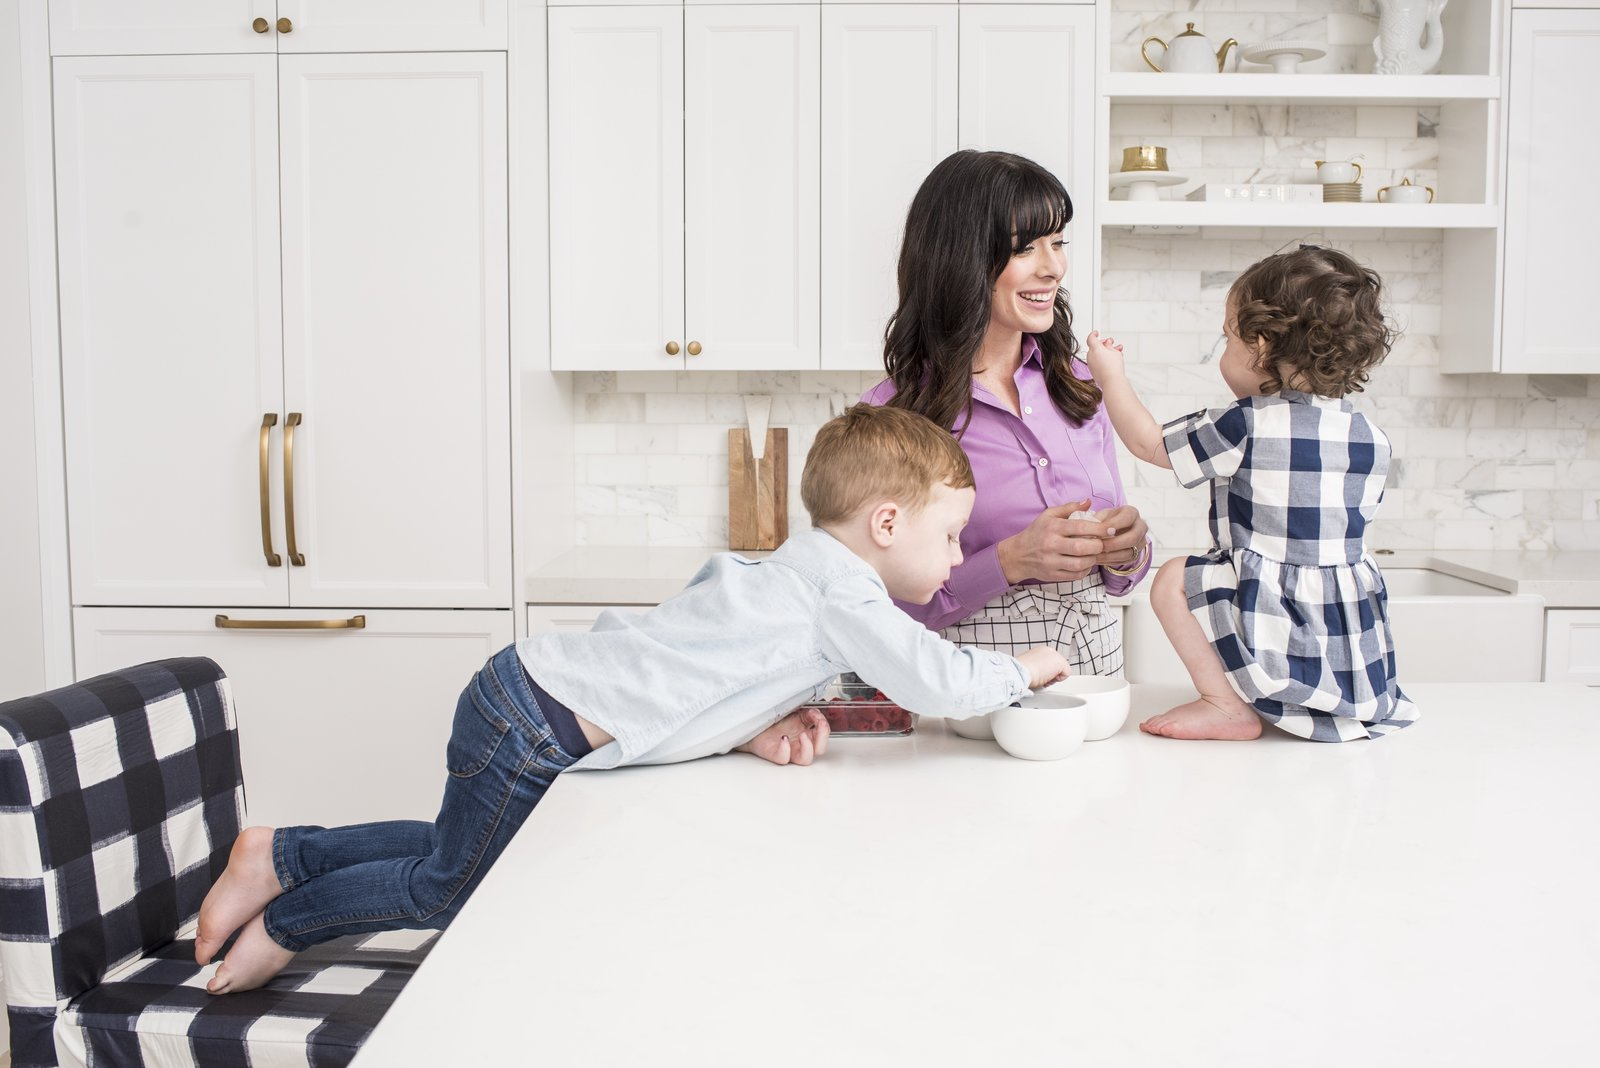 Photo 2 of 8 in An Interior Designer's Streamlined Kitchen